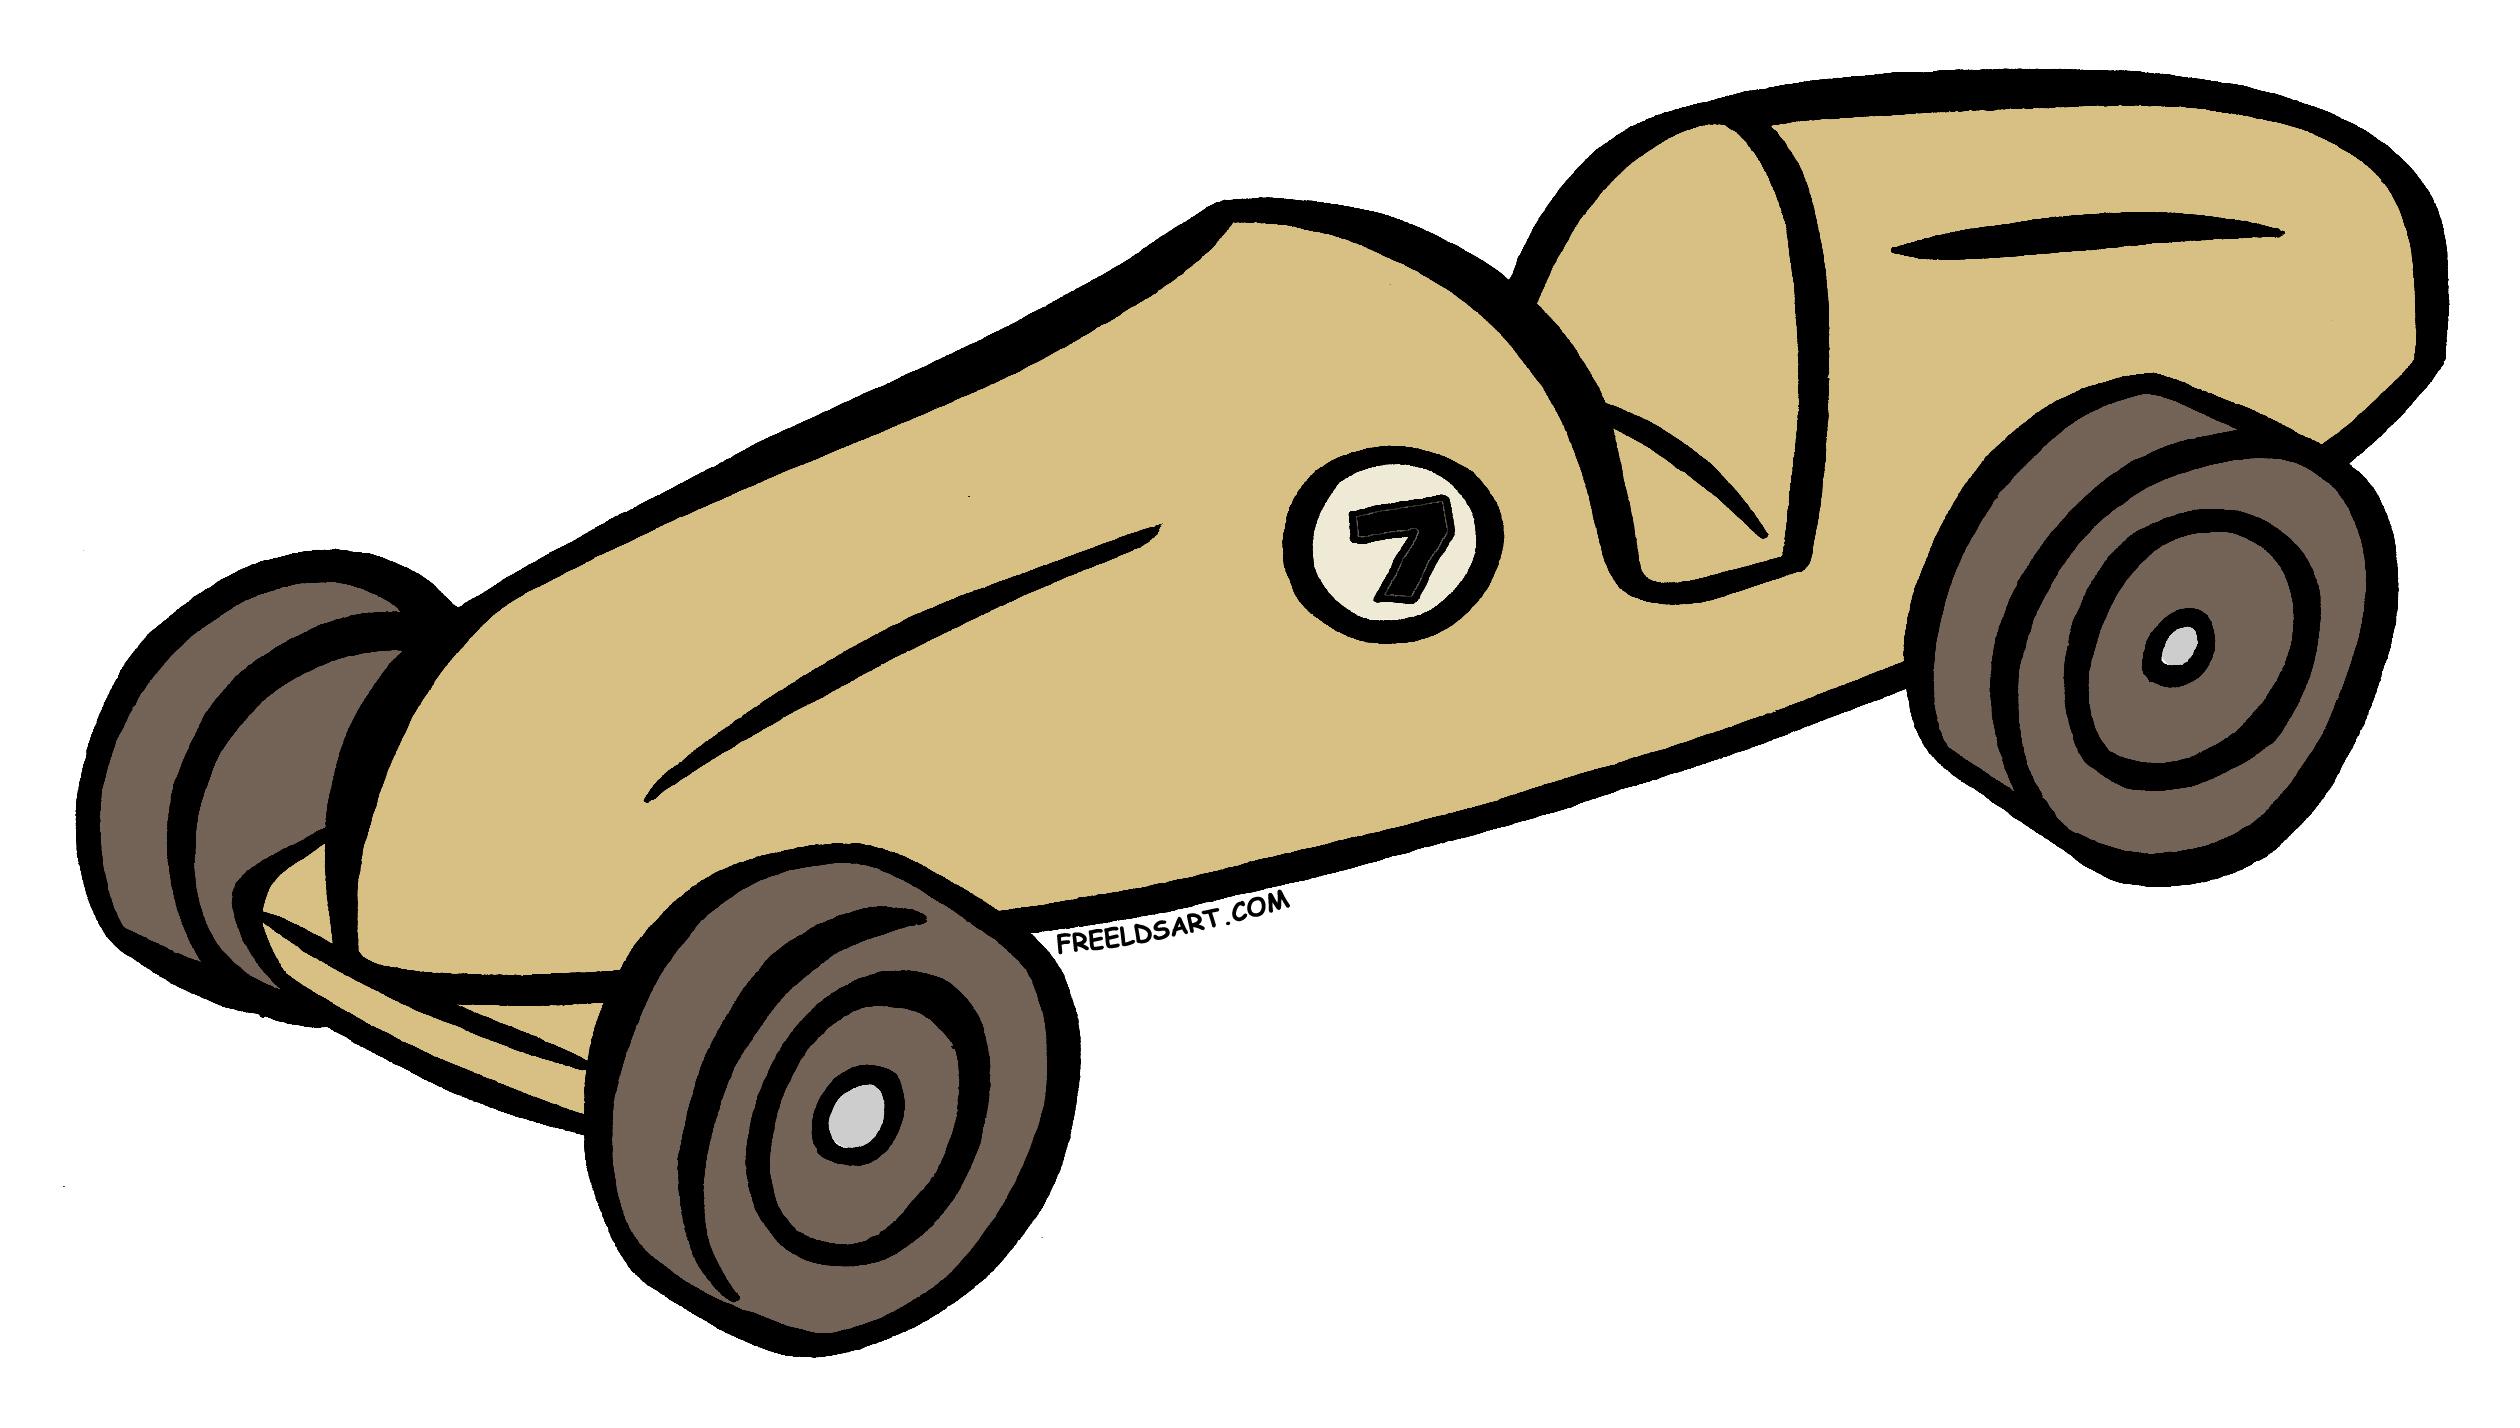 Pinewood Derby Car Clip Art N10 free image.